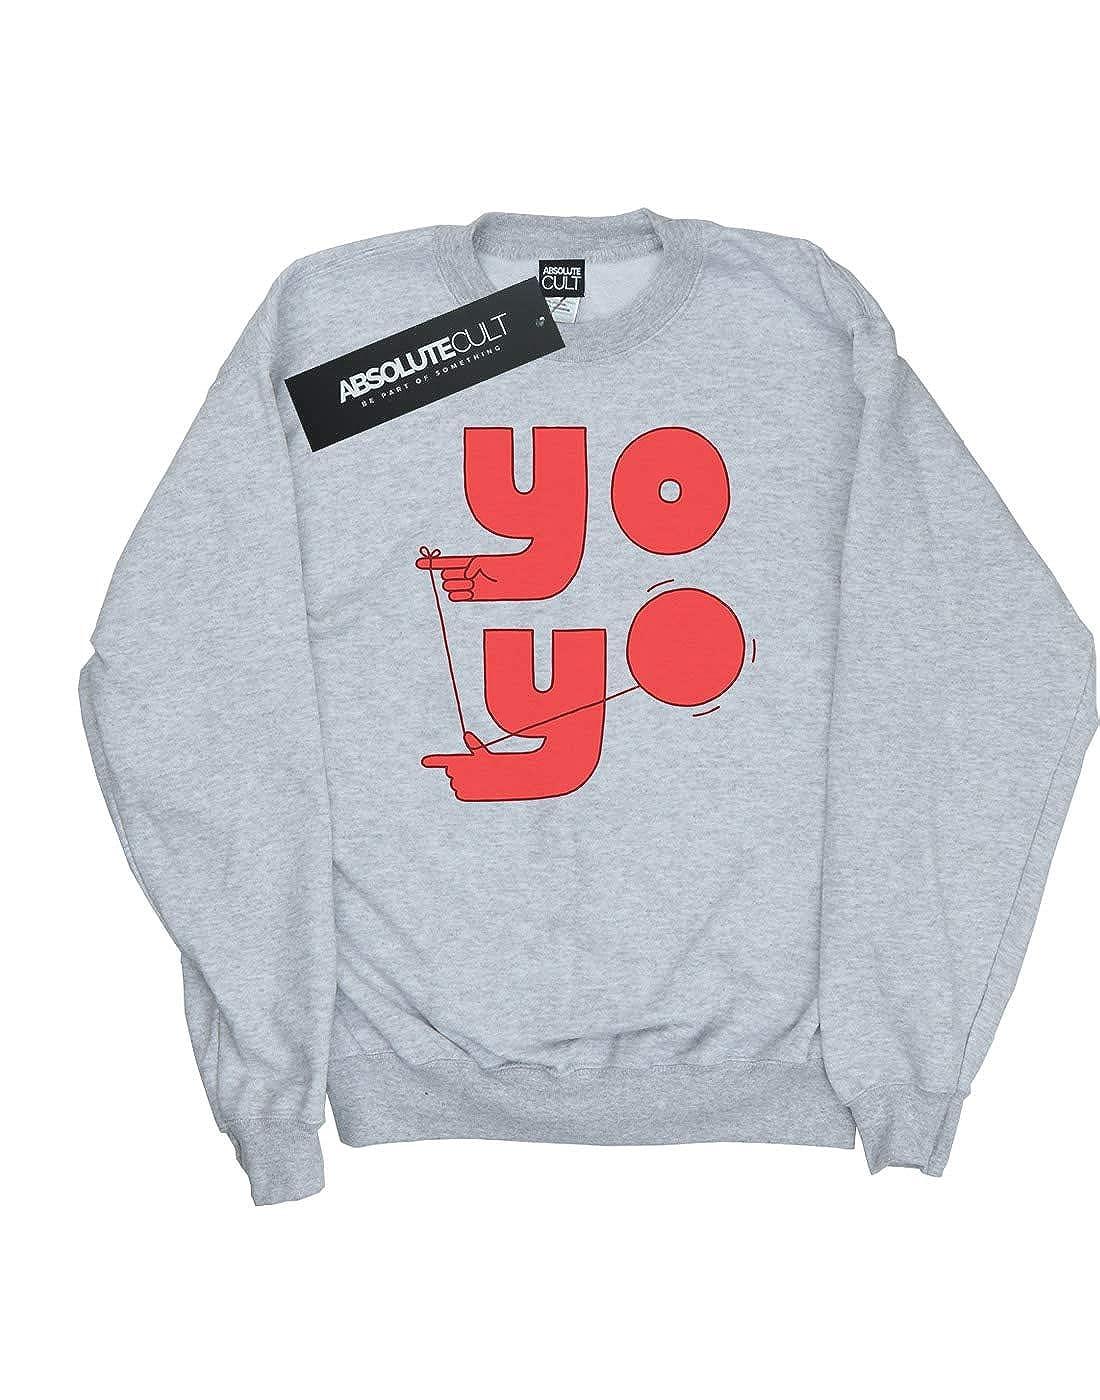 Absolute Cult Jaco Haasbroek Girls Yo Yo Sweatshirt